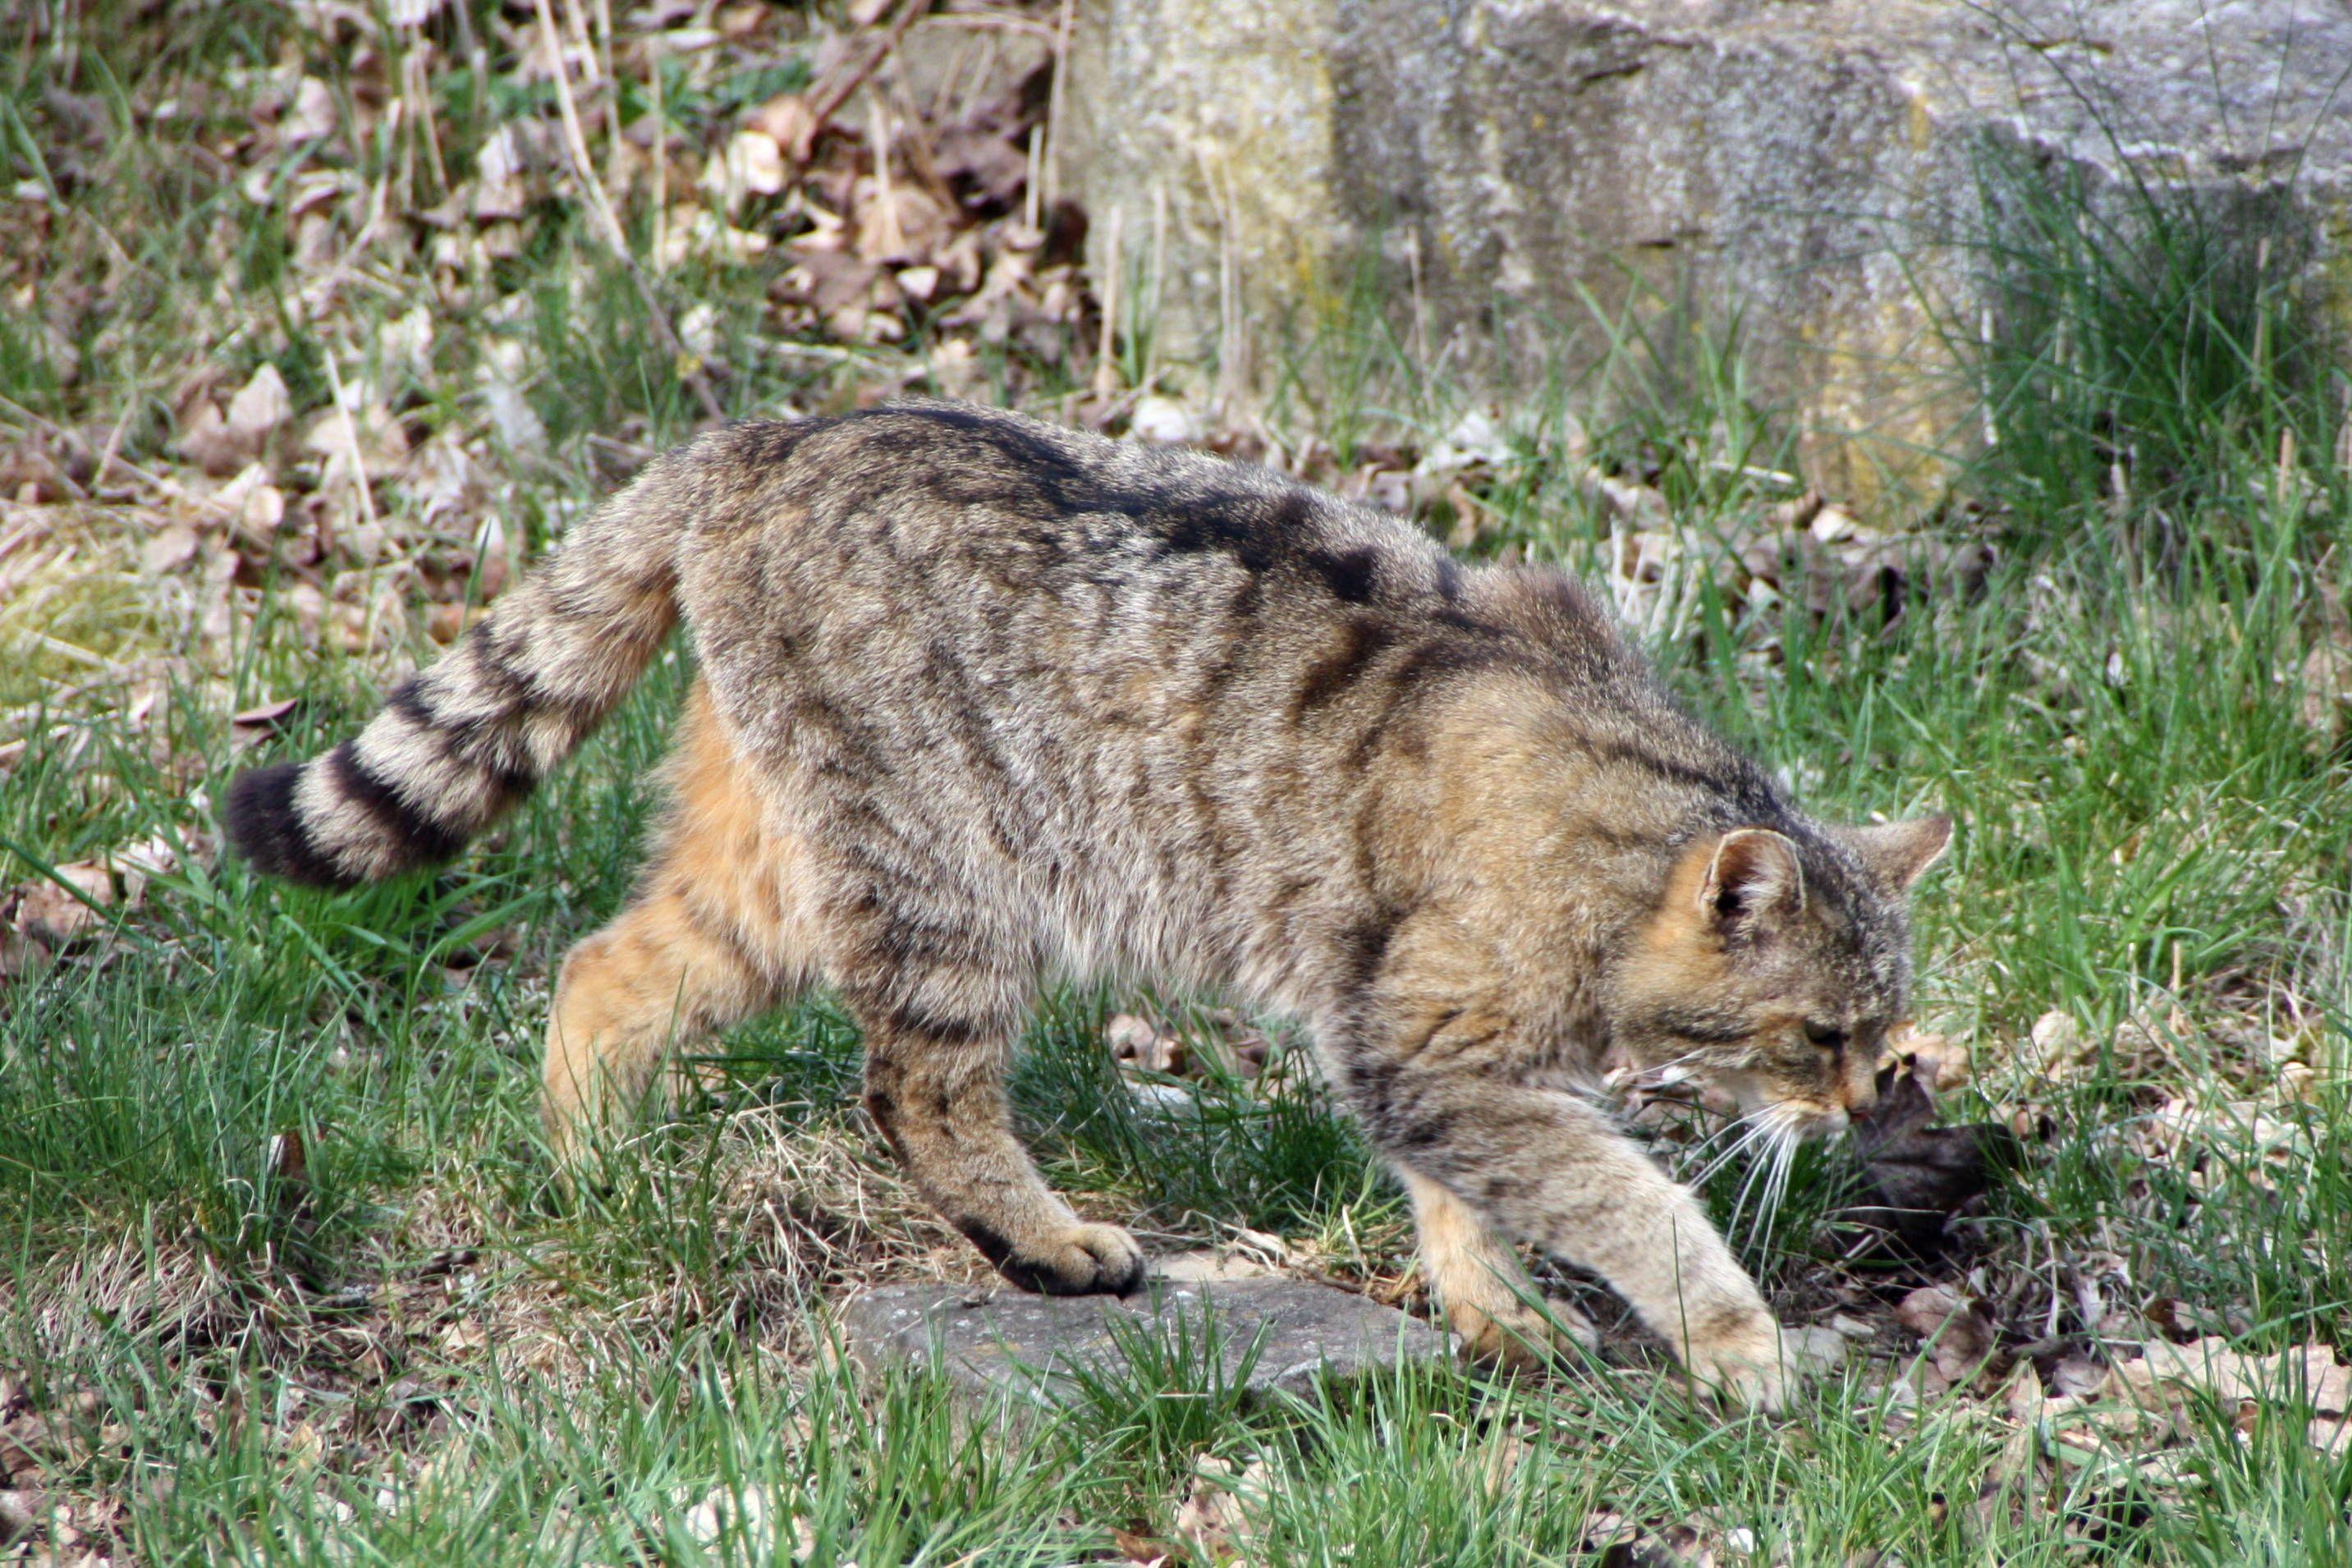 Schwarzwald wildcat - Google Search